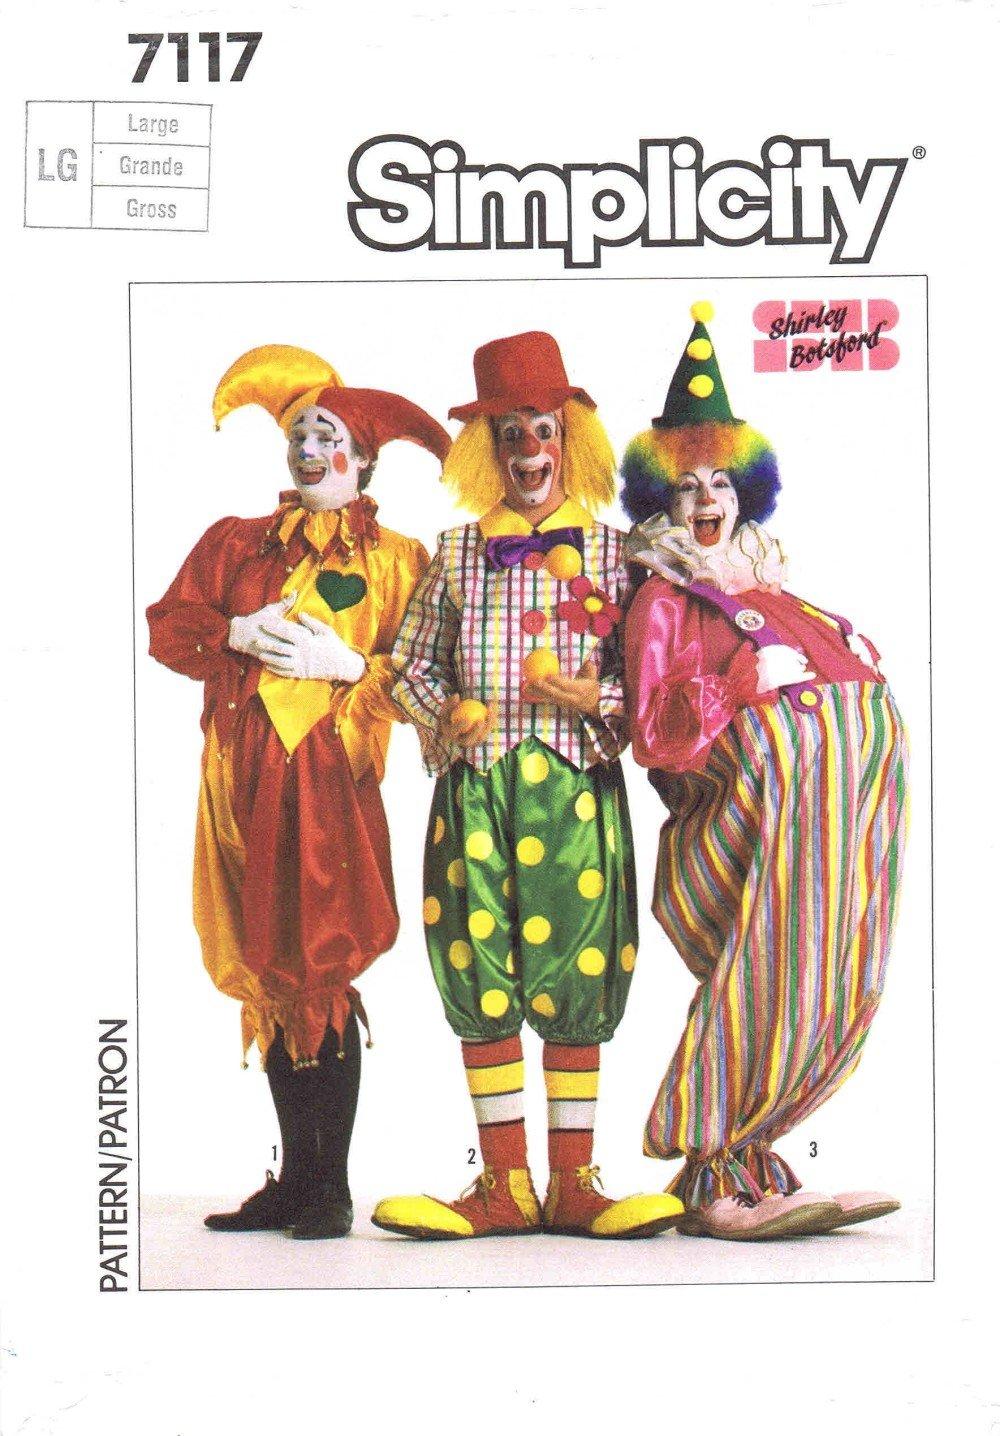 f70b7243e15 Amazon.com  Simplicity 7117 Sewing Pattern Jester Hobo Clown Costumes Chest  36 - 38  Arts